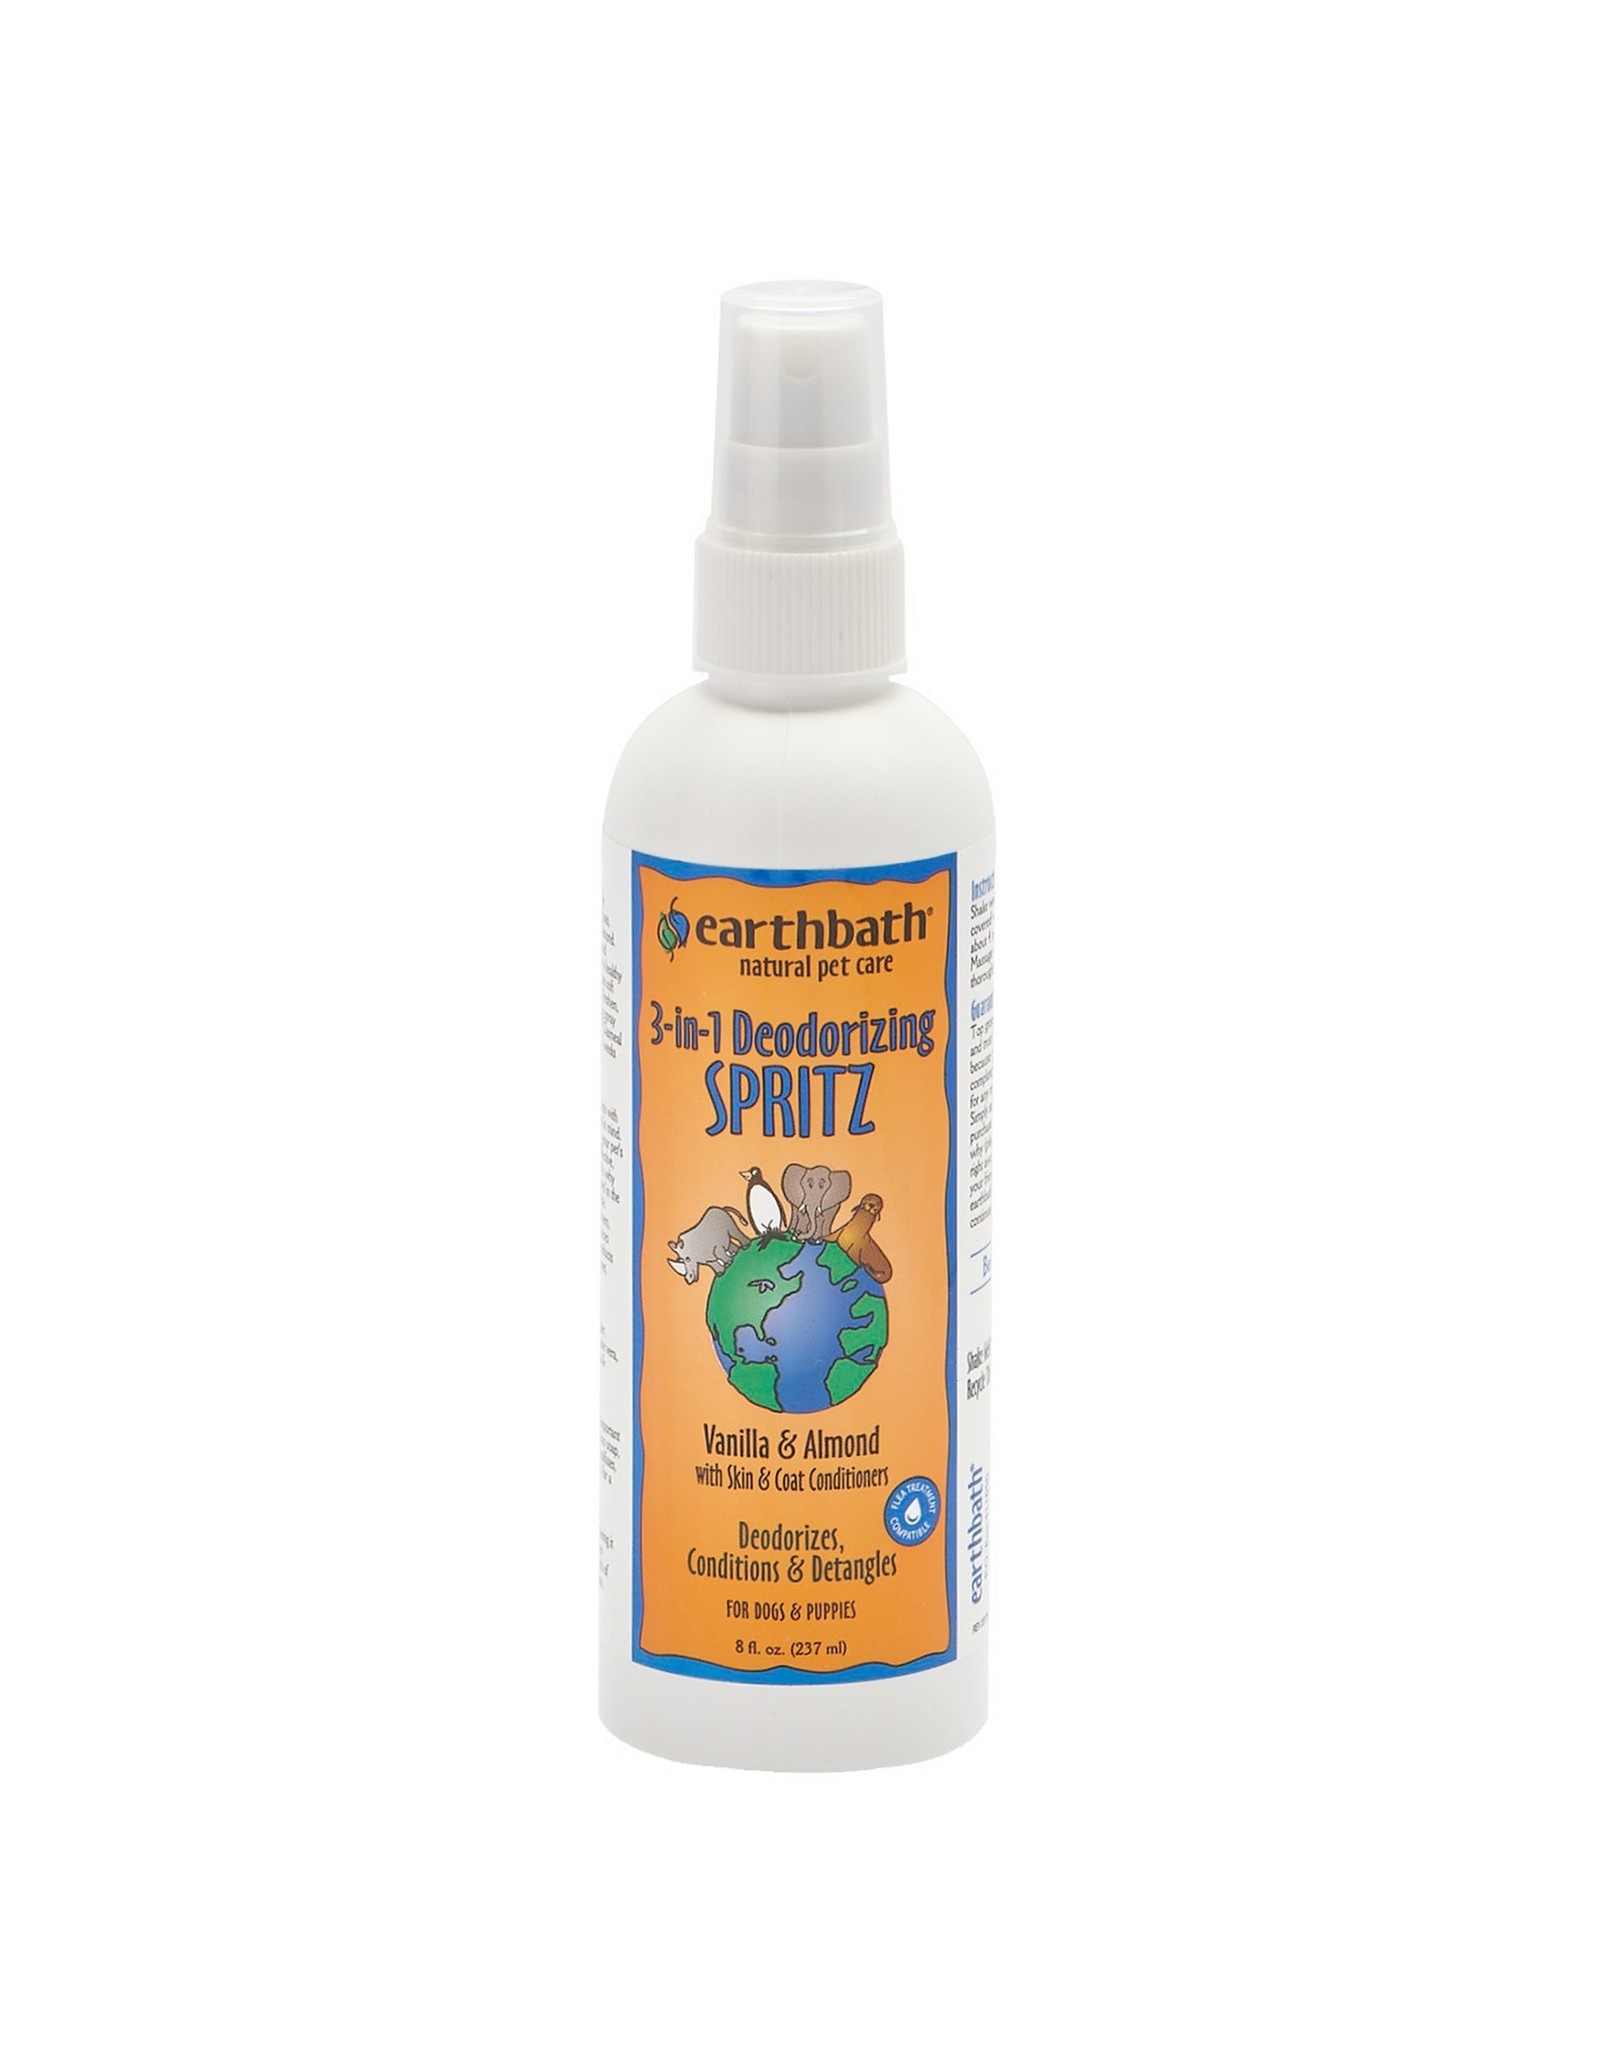 Earthbath Earthbath Deodorizing Spritz Vanilla Almond 8oz